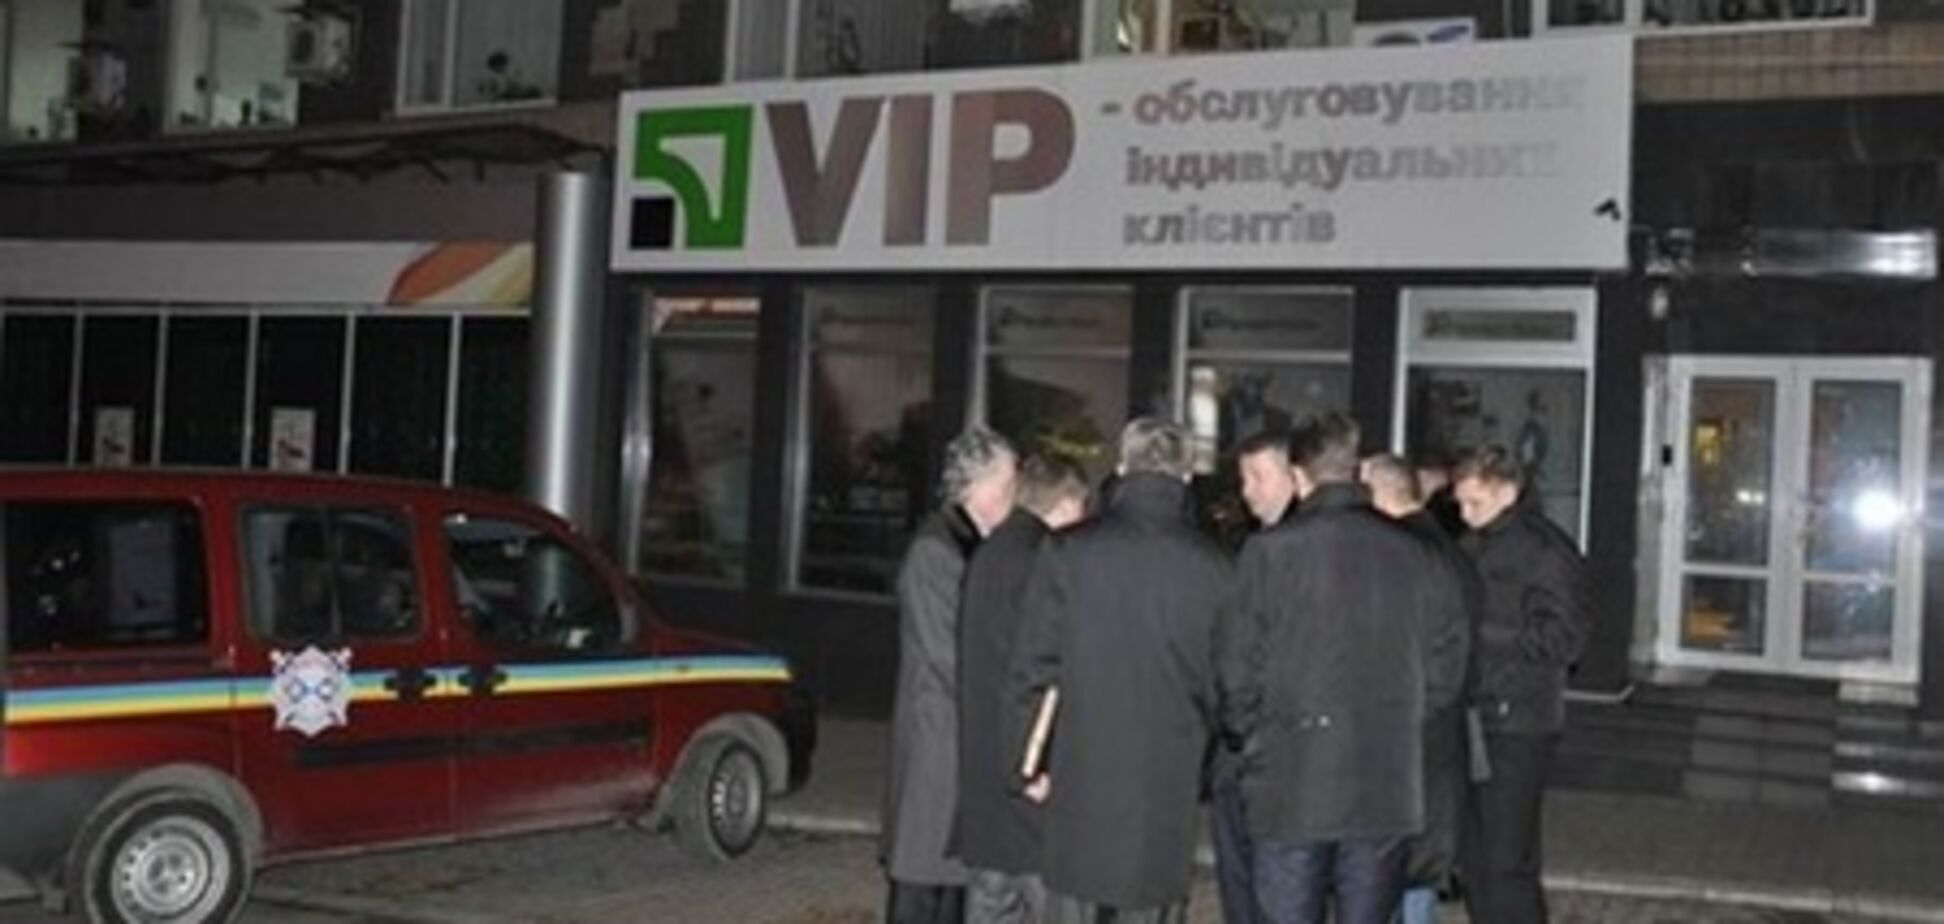 Убийцам работников банка предъявили обвинение